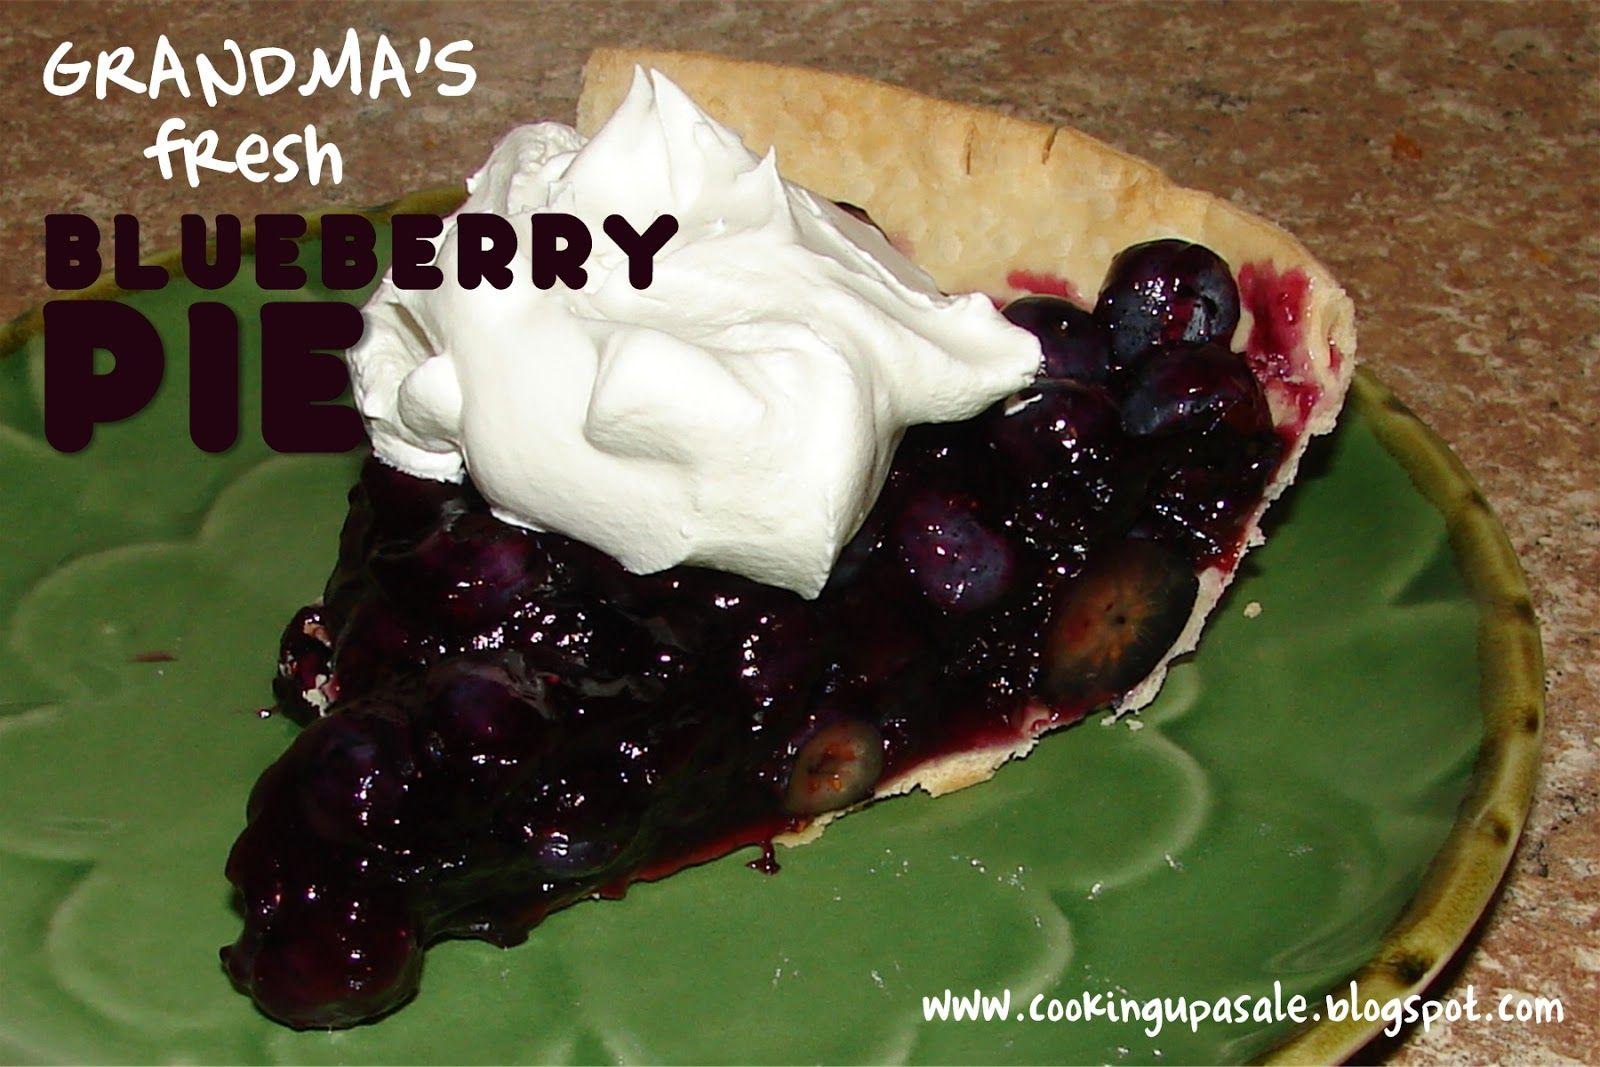 Grandma's Fresh Blueberry Pie